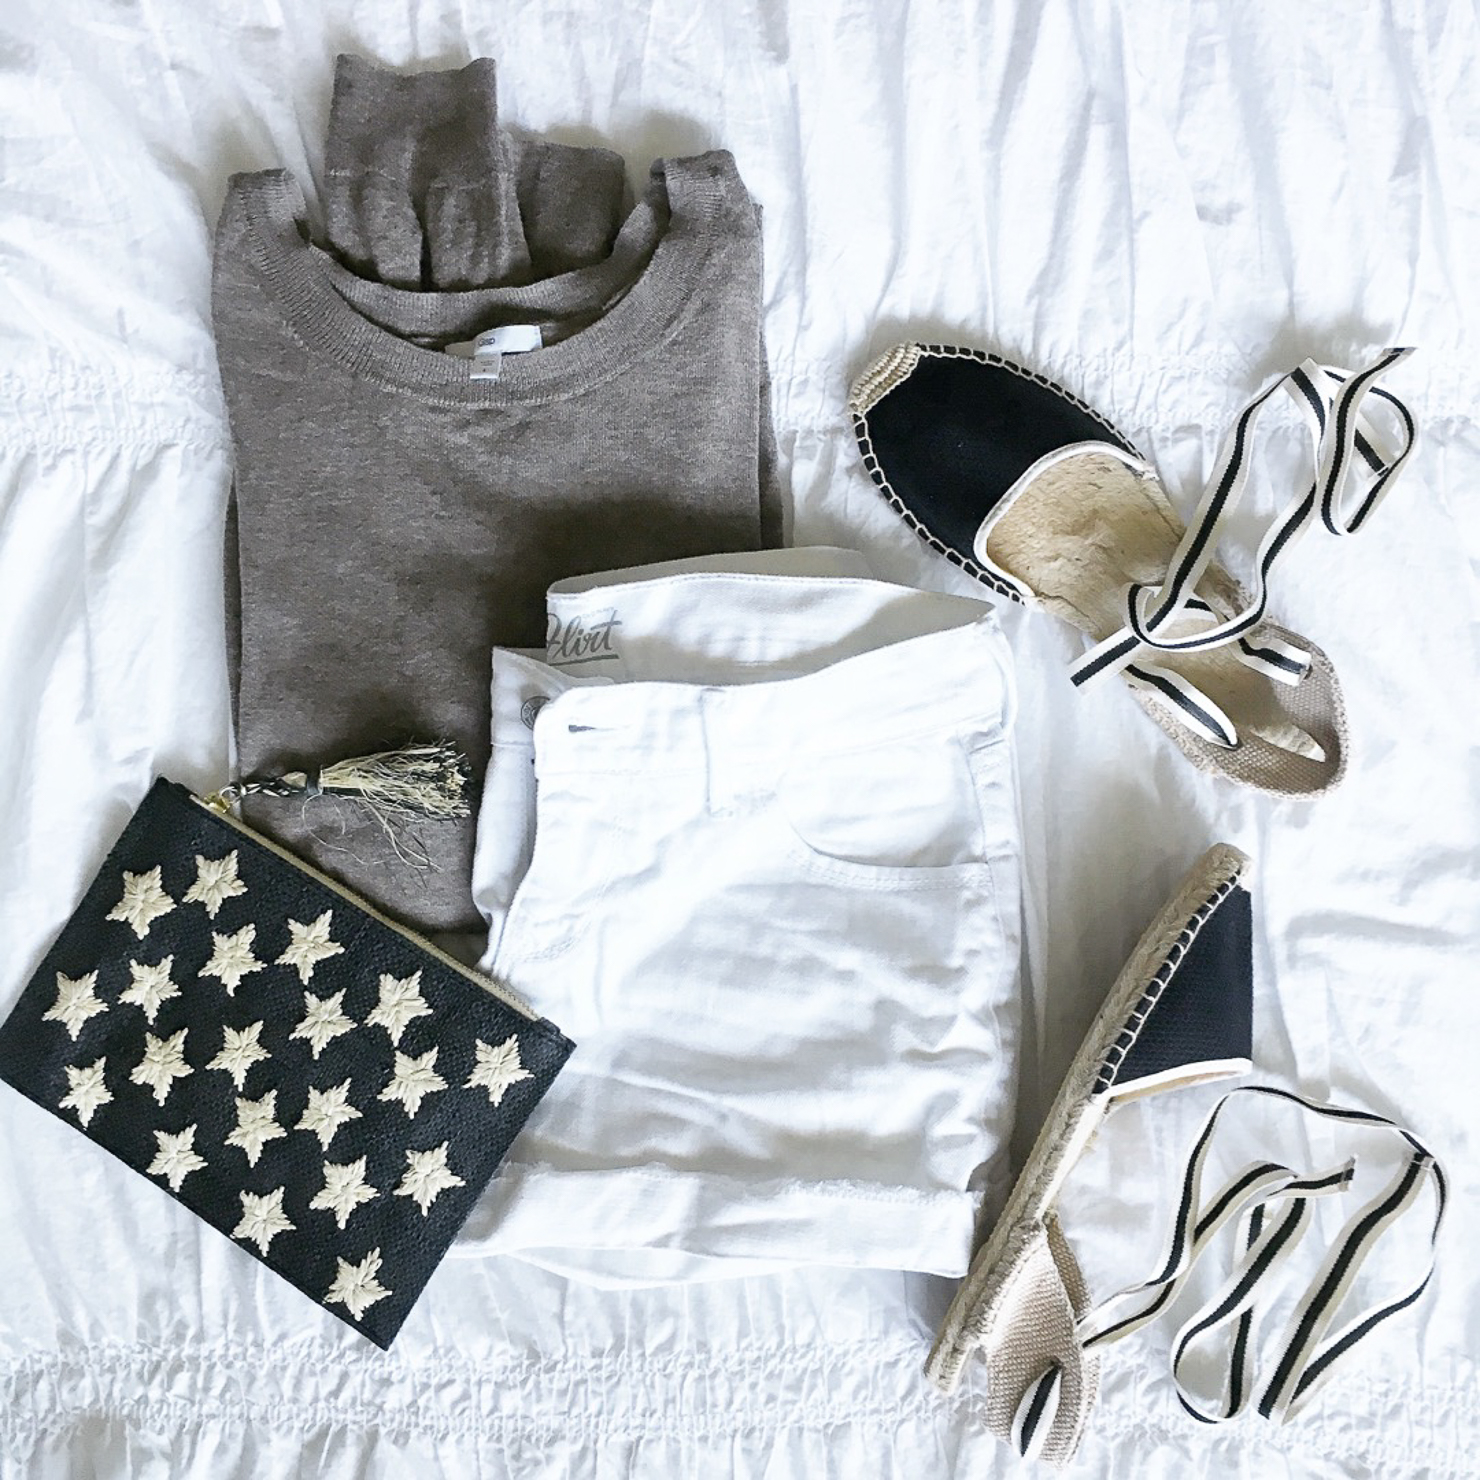 kayu-black-star-pouch-soludos-espadrilles-white-jeans-